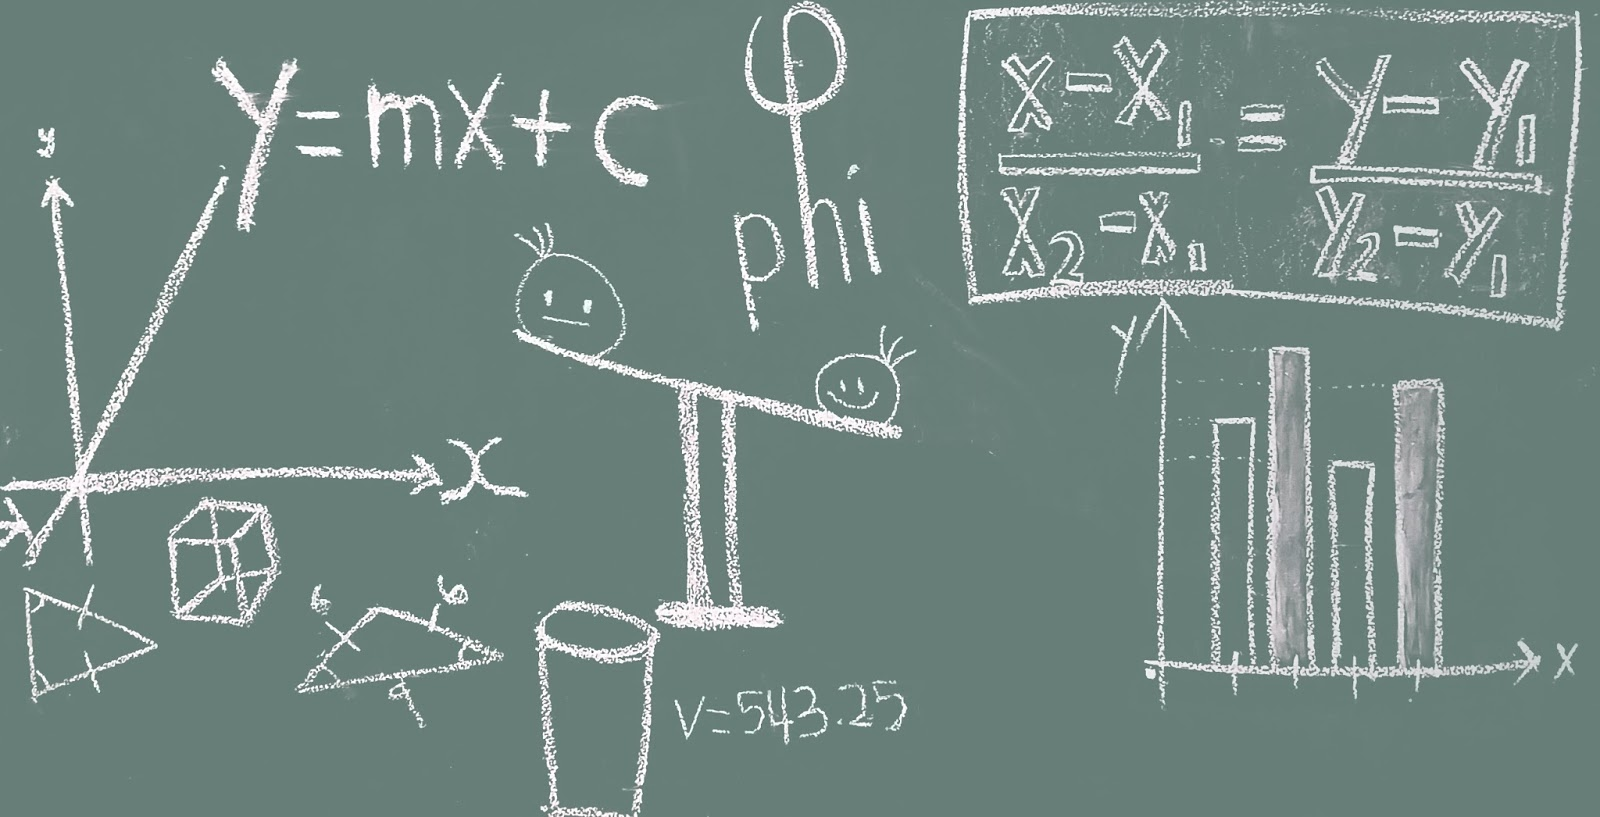 Tips Belajar Matematika Yang Baik (Catatan Orang Tua)